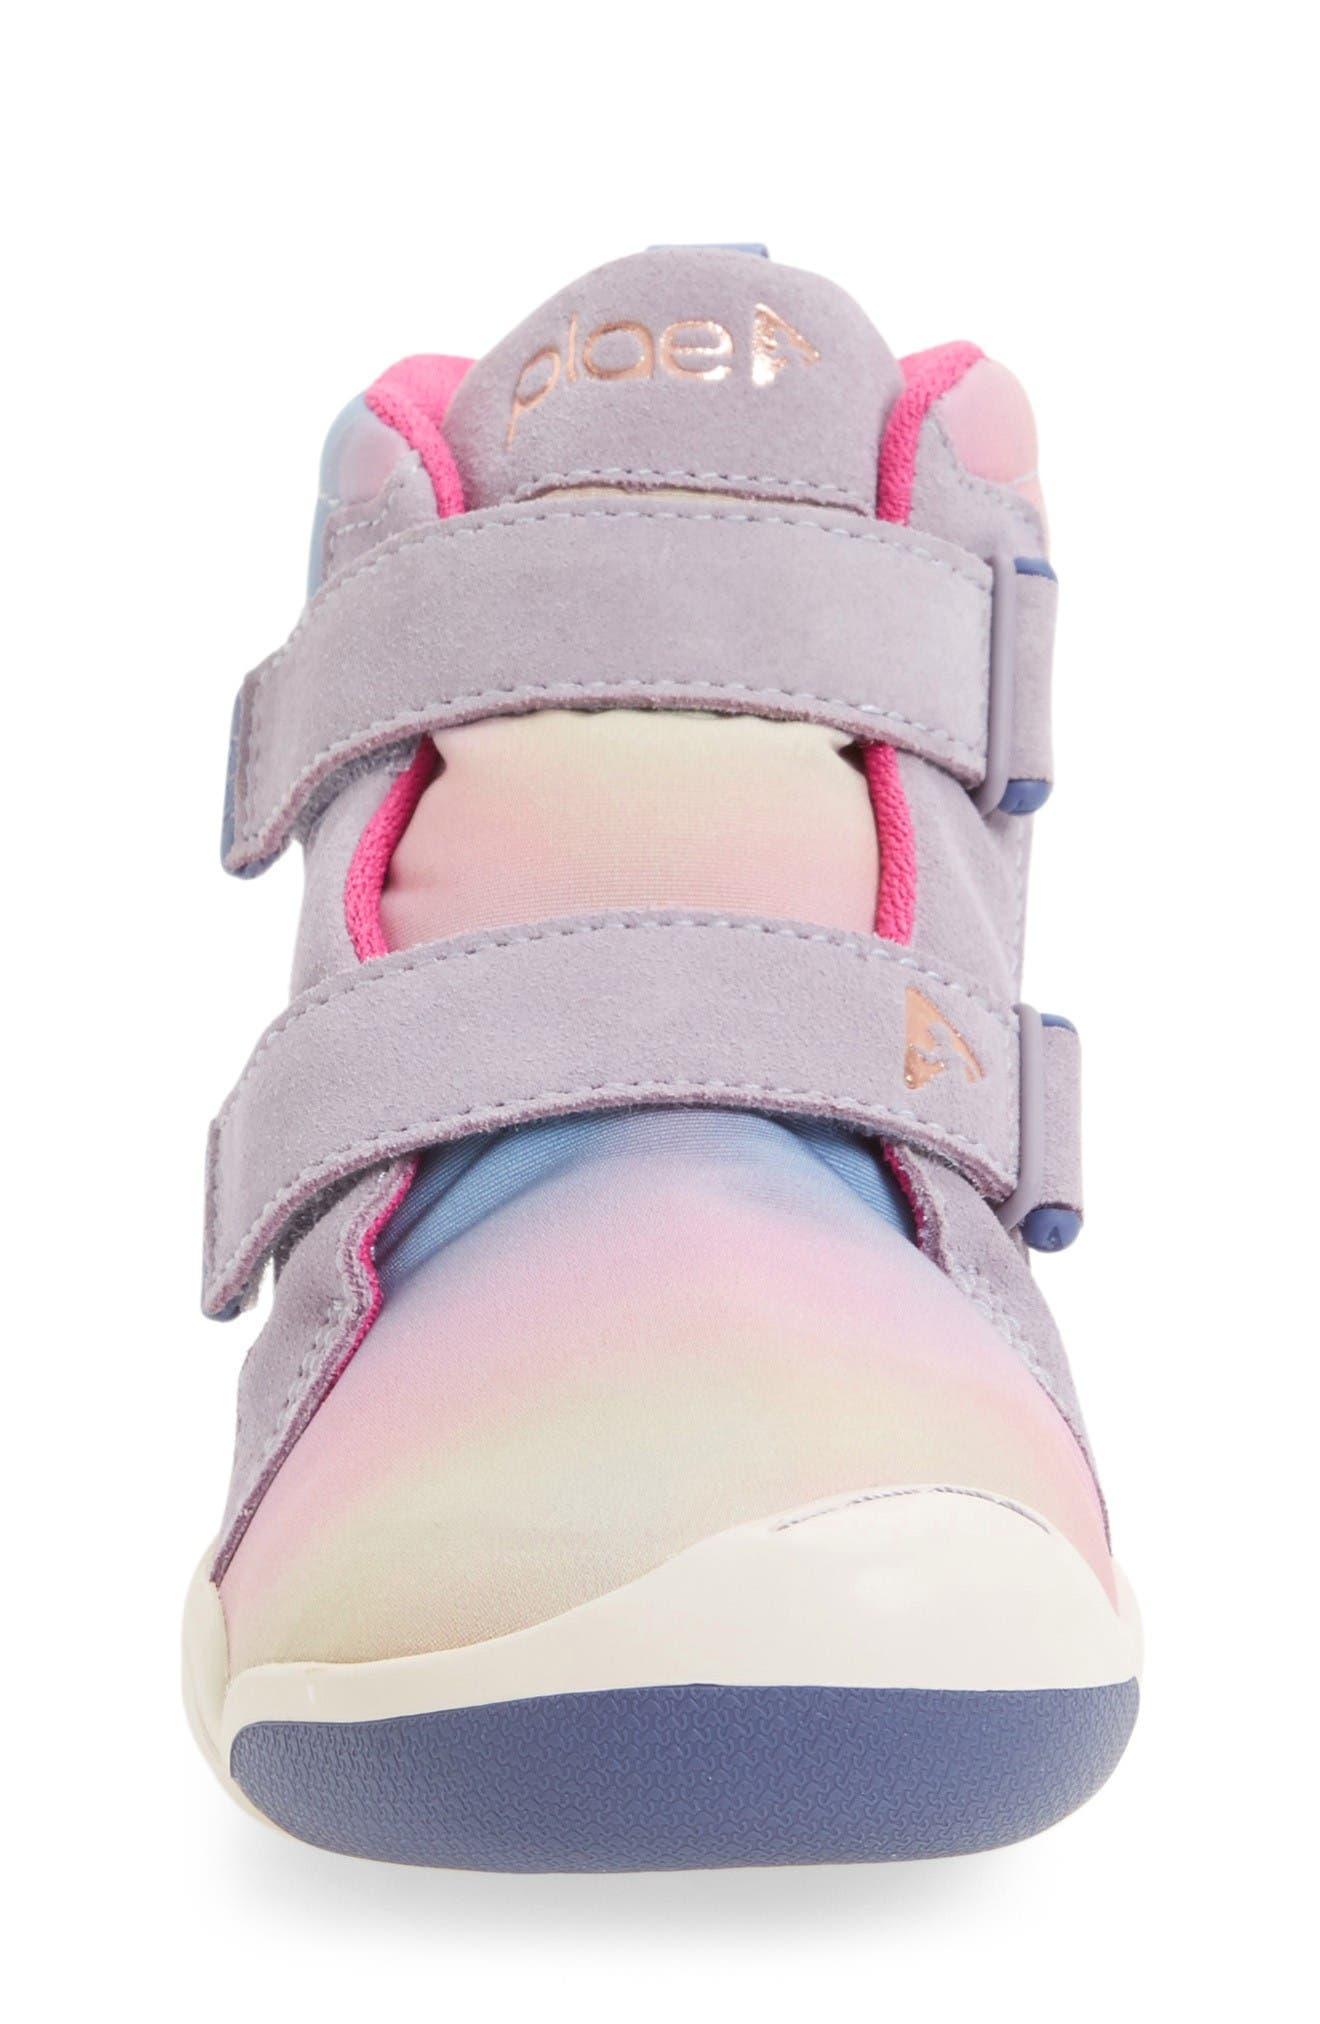 Max Customizable High Top Sneaker,                             Alternate thumbnail 3, color,                             Fun Aurora Suede